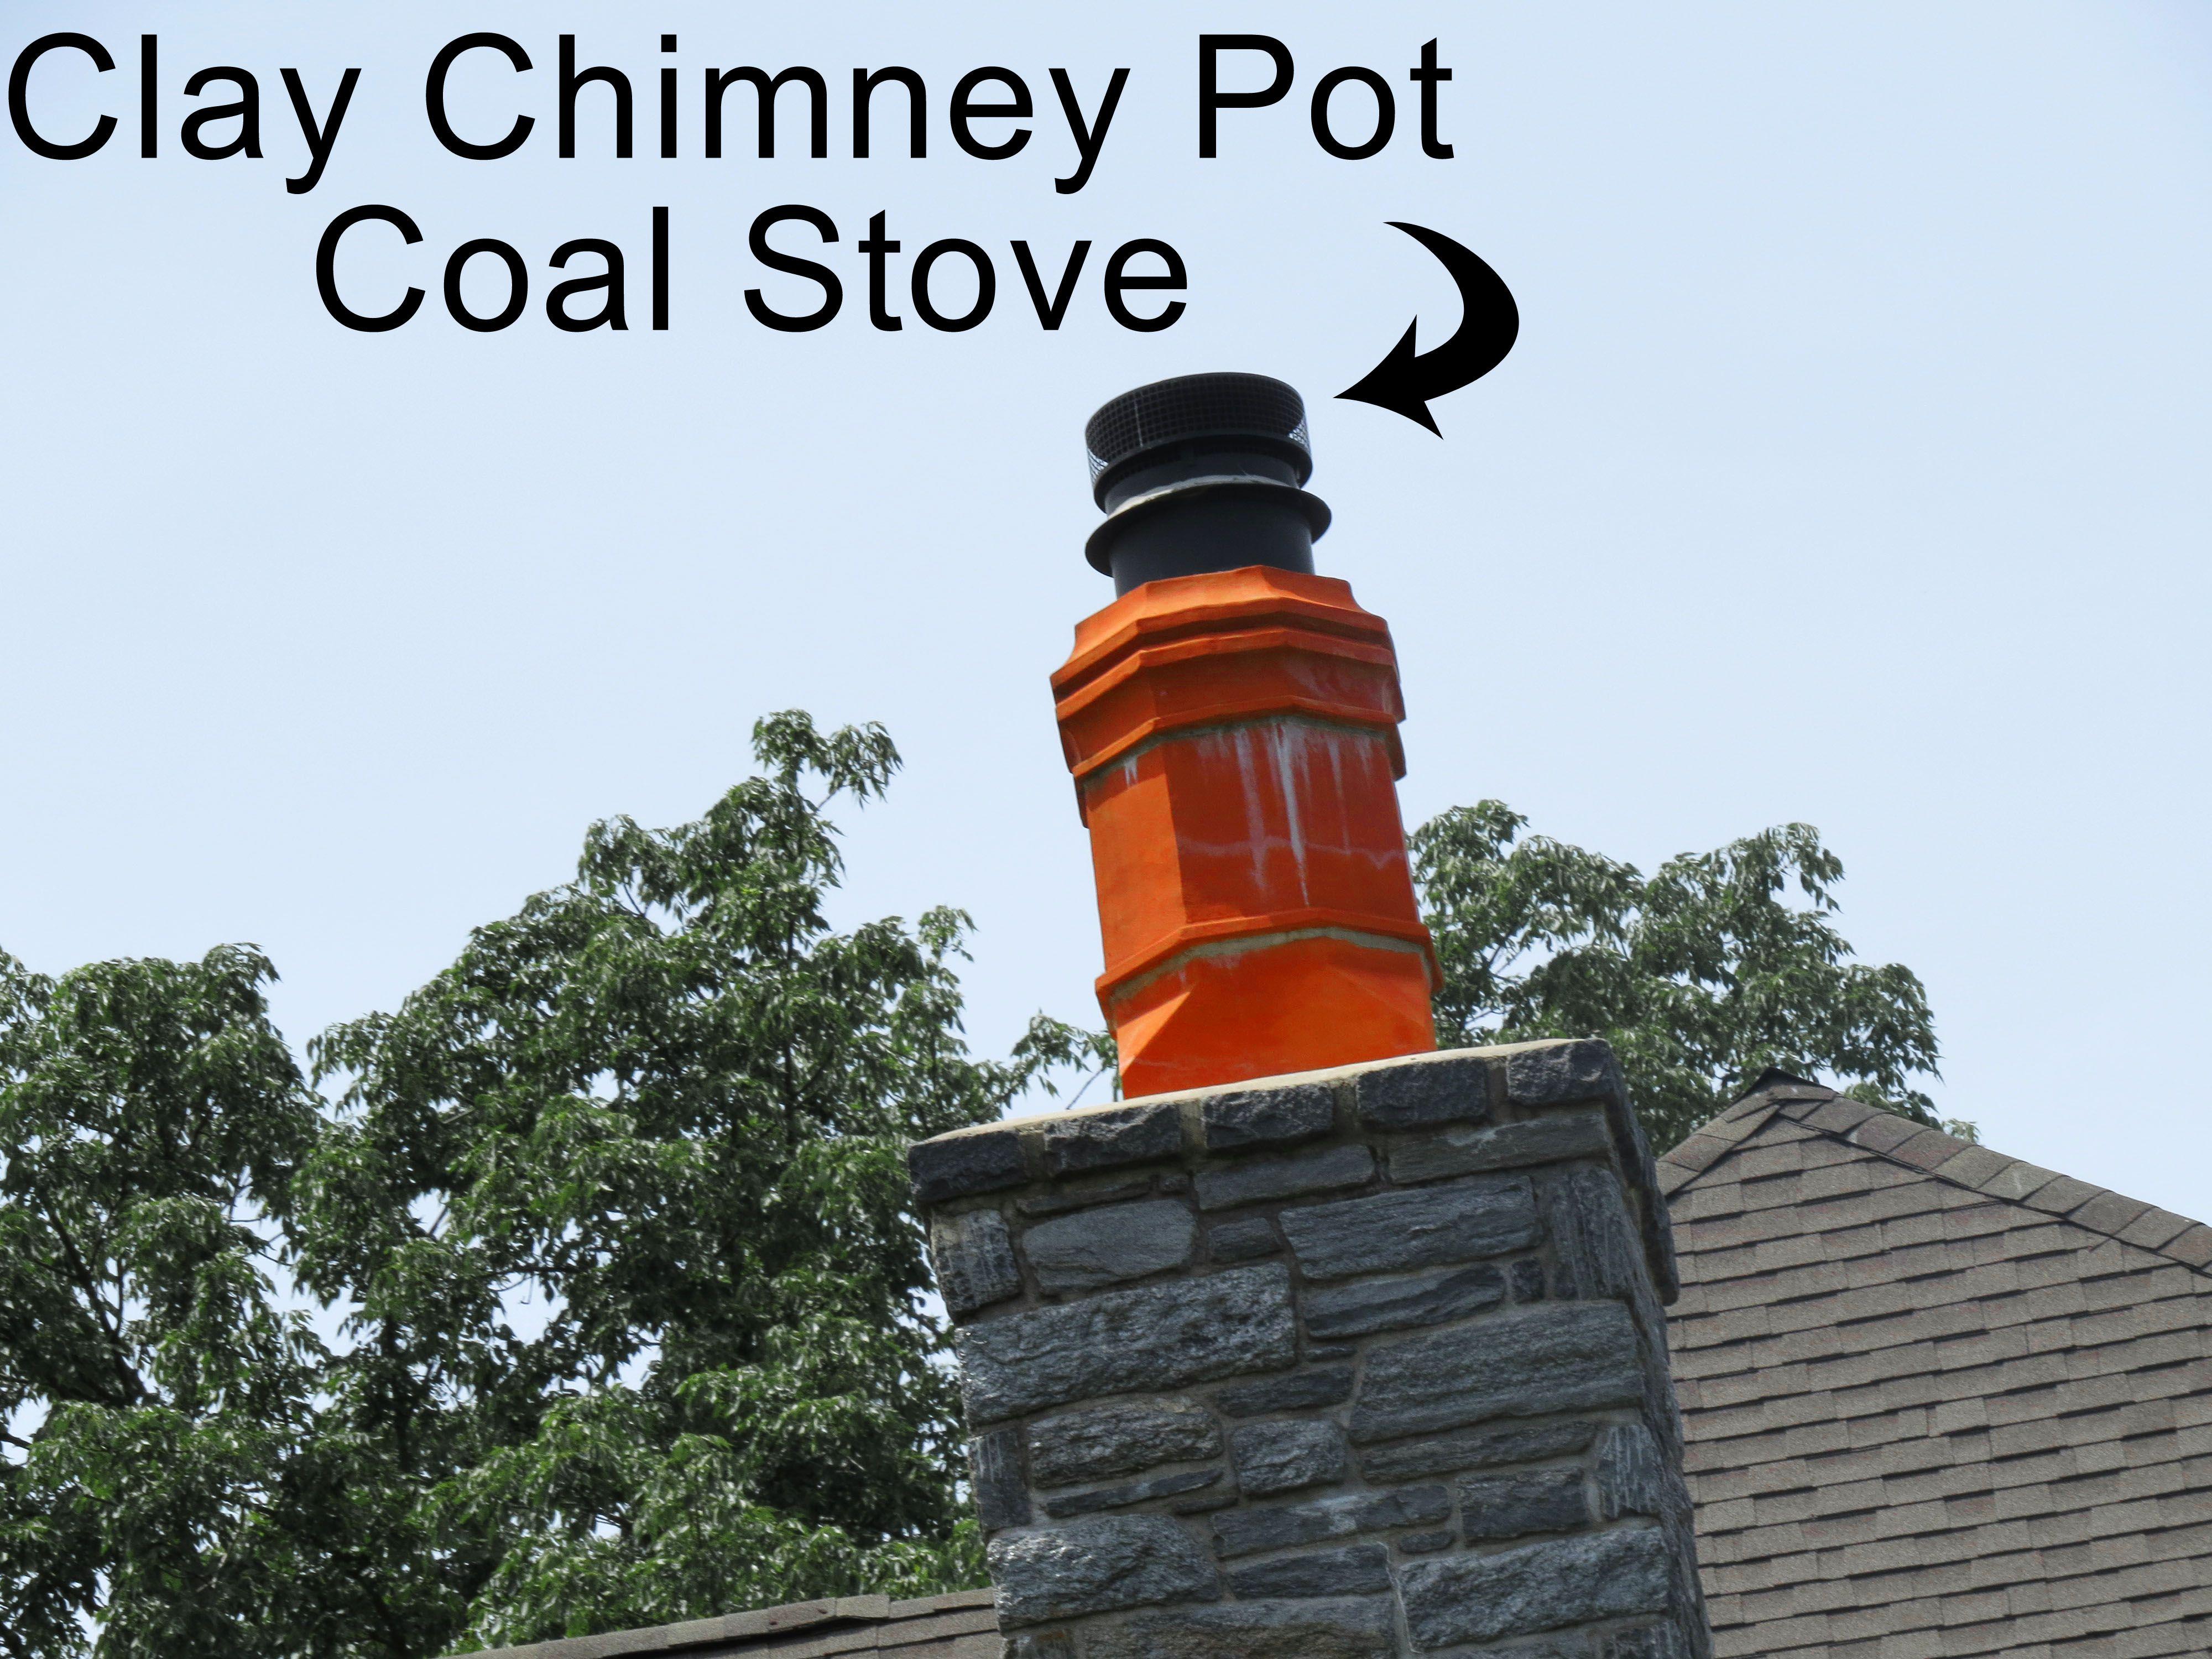 Clay Chimney Pot Over A Coal Stove Top Coal Stove Clay Pot